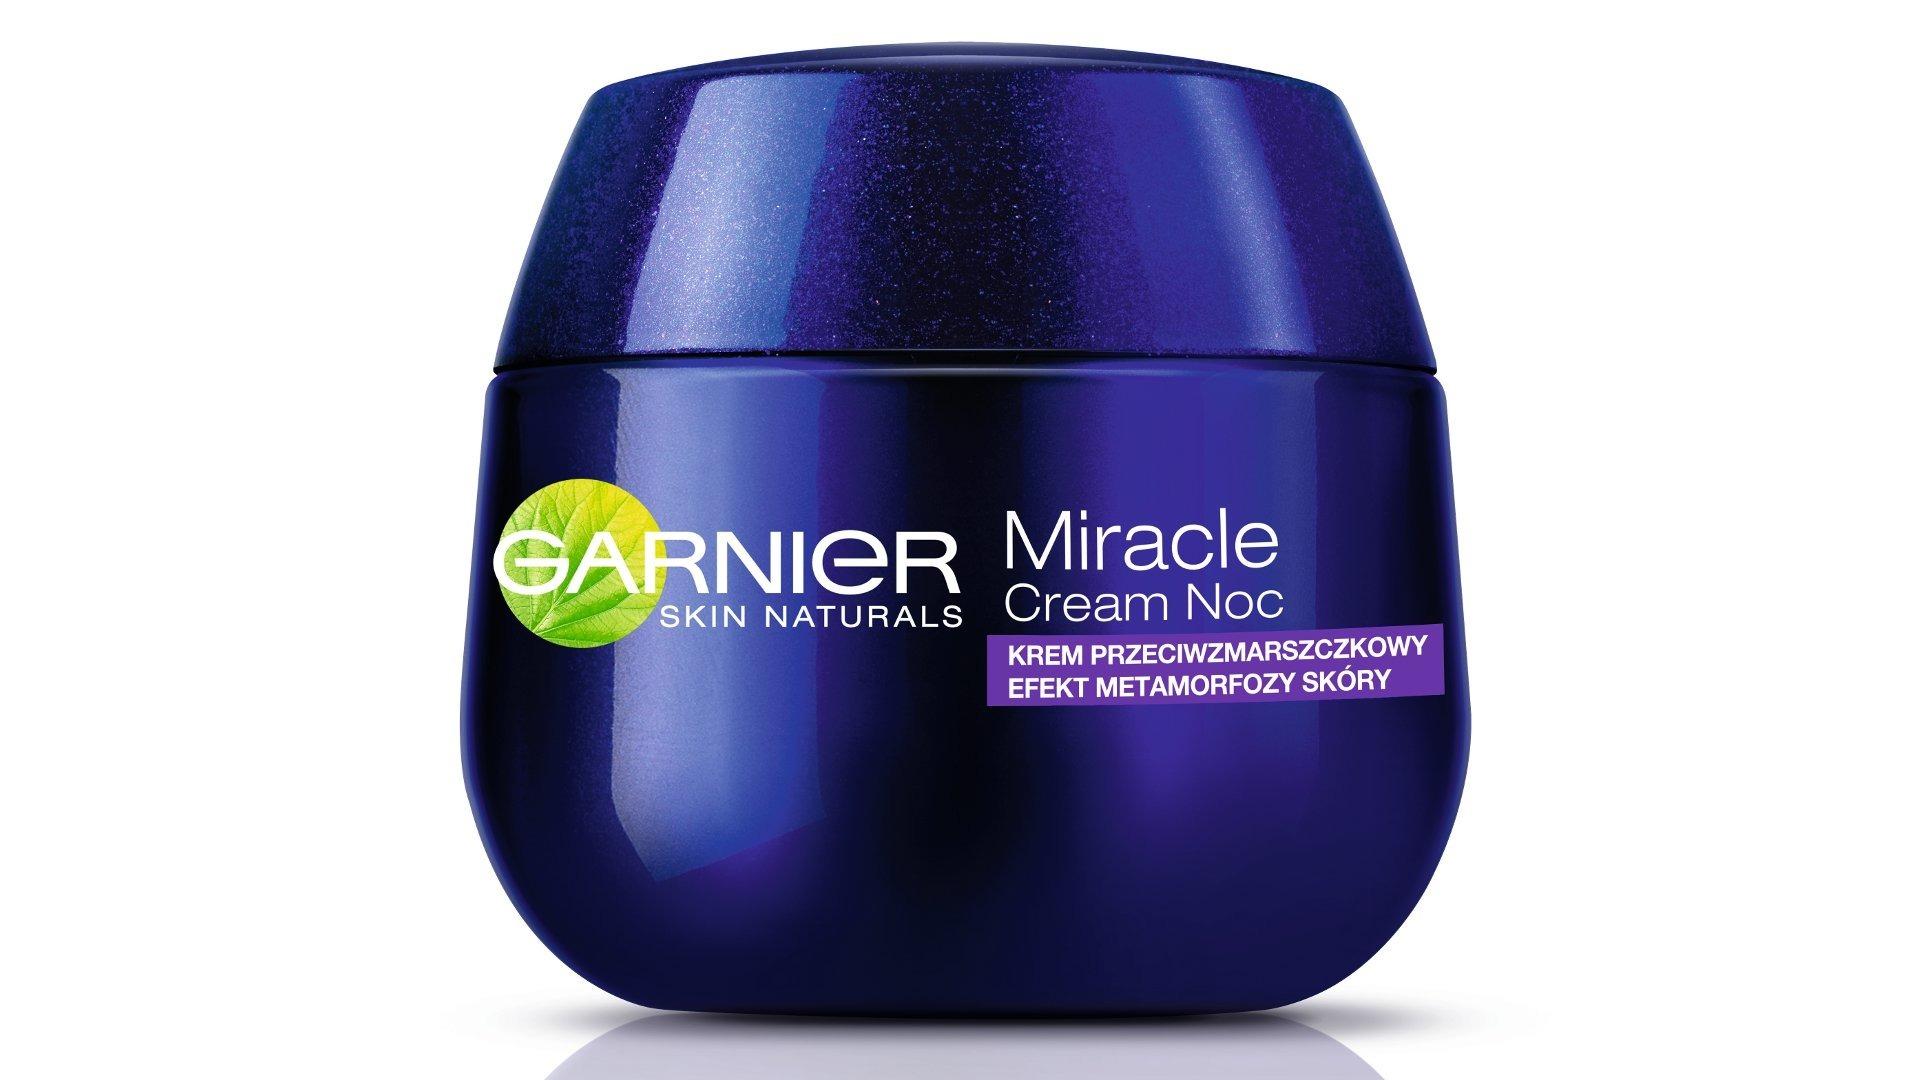 Nowy Miracle Cream Noc Garnier Wizazpl